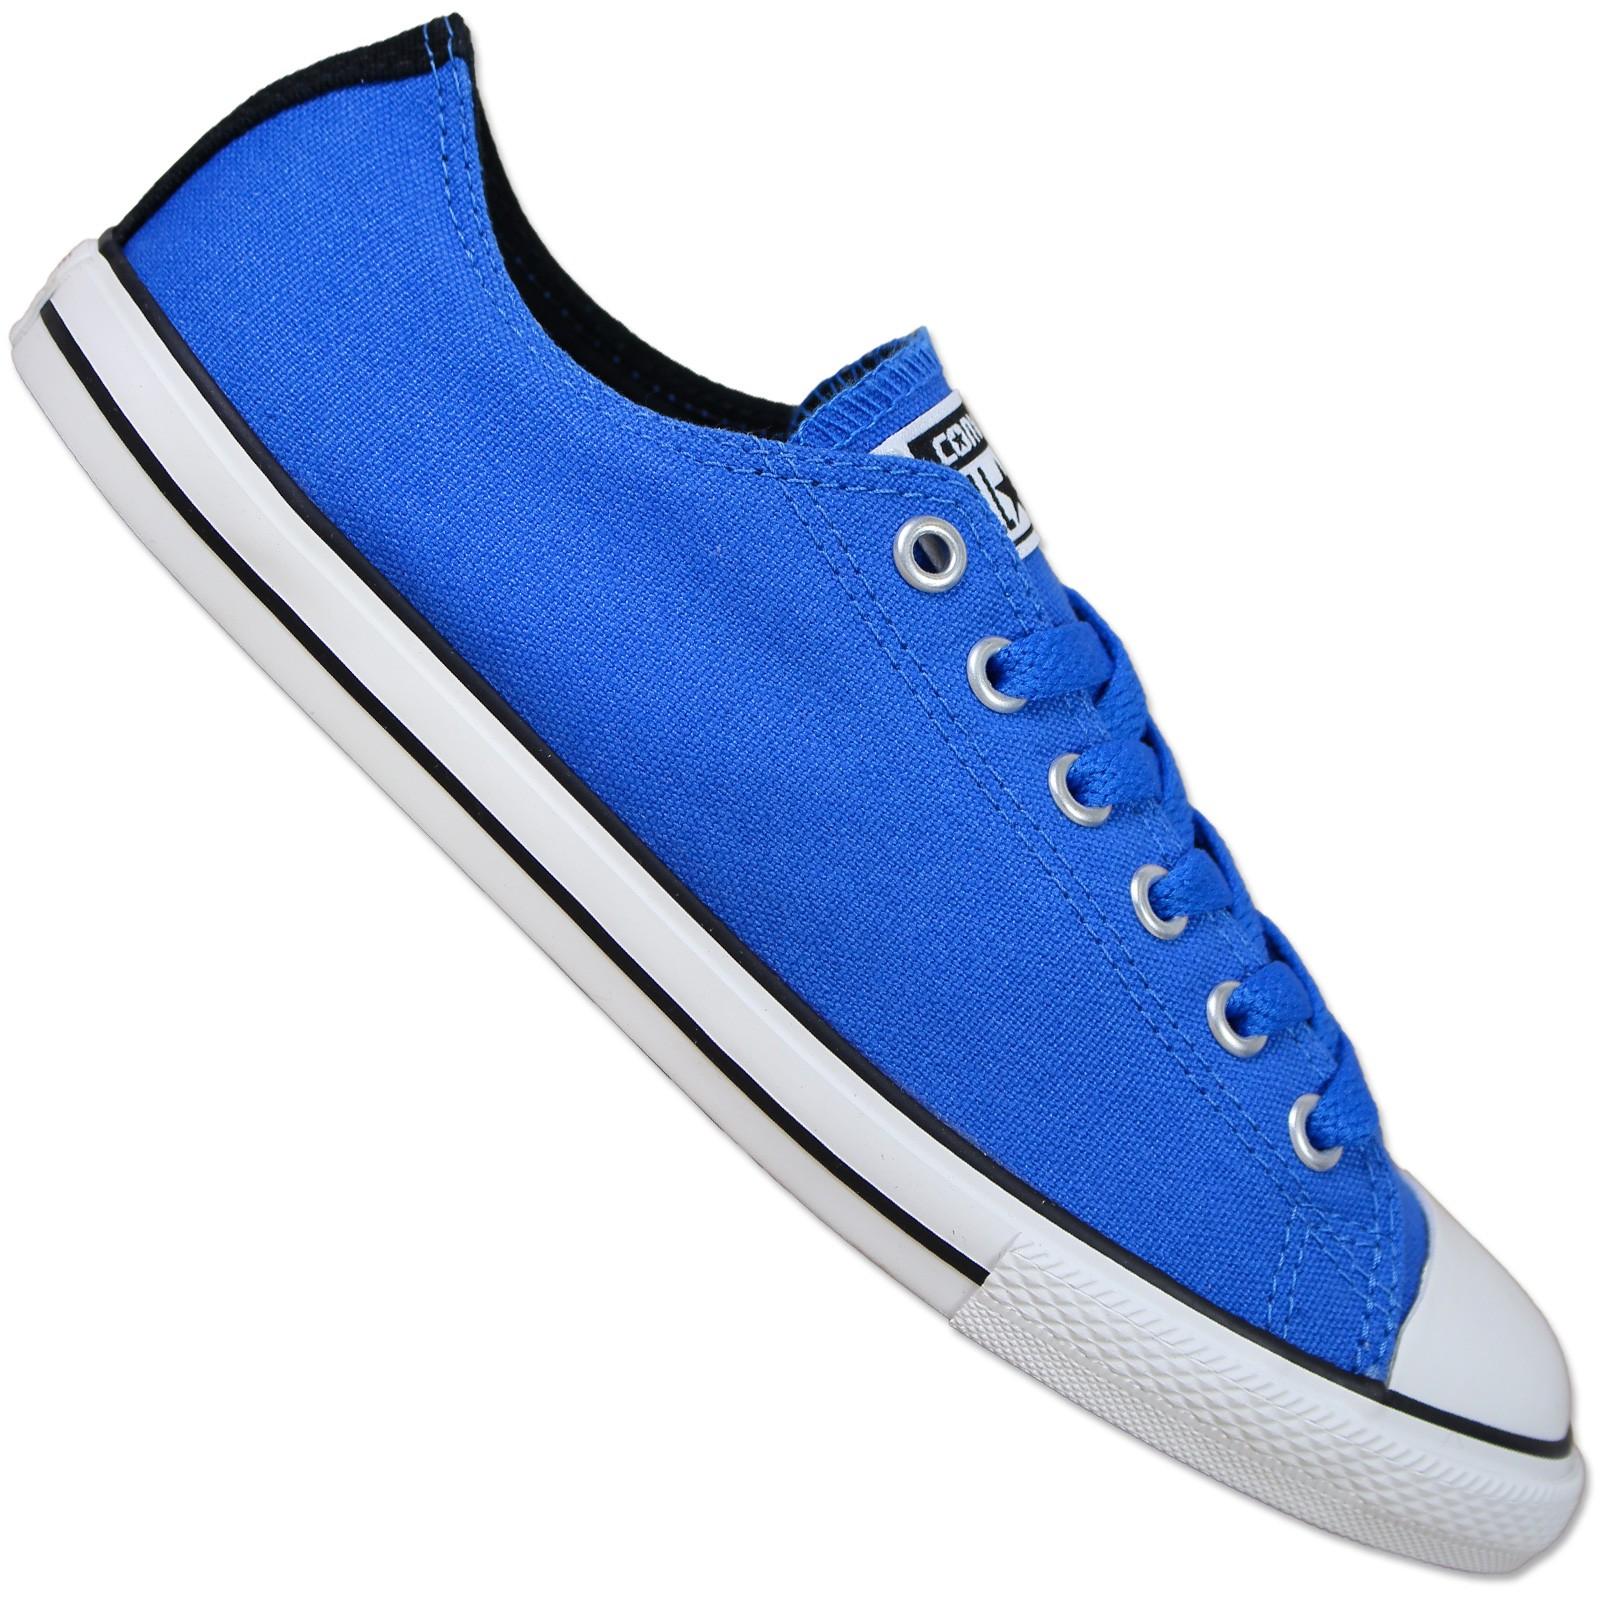 converse ct east coater star chuck taylor ox schuhe blau kinder damen sneaker kinder schuhe. Black Bedroom Furniture Sets. Home Design Ideas